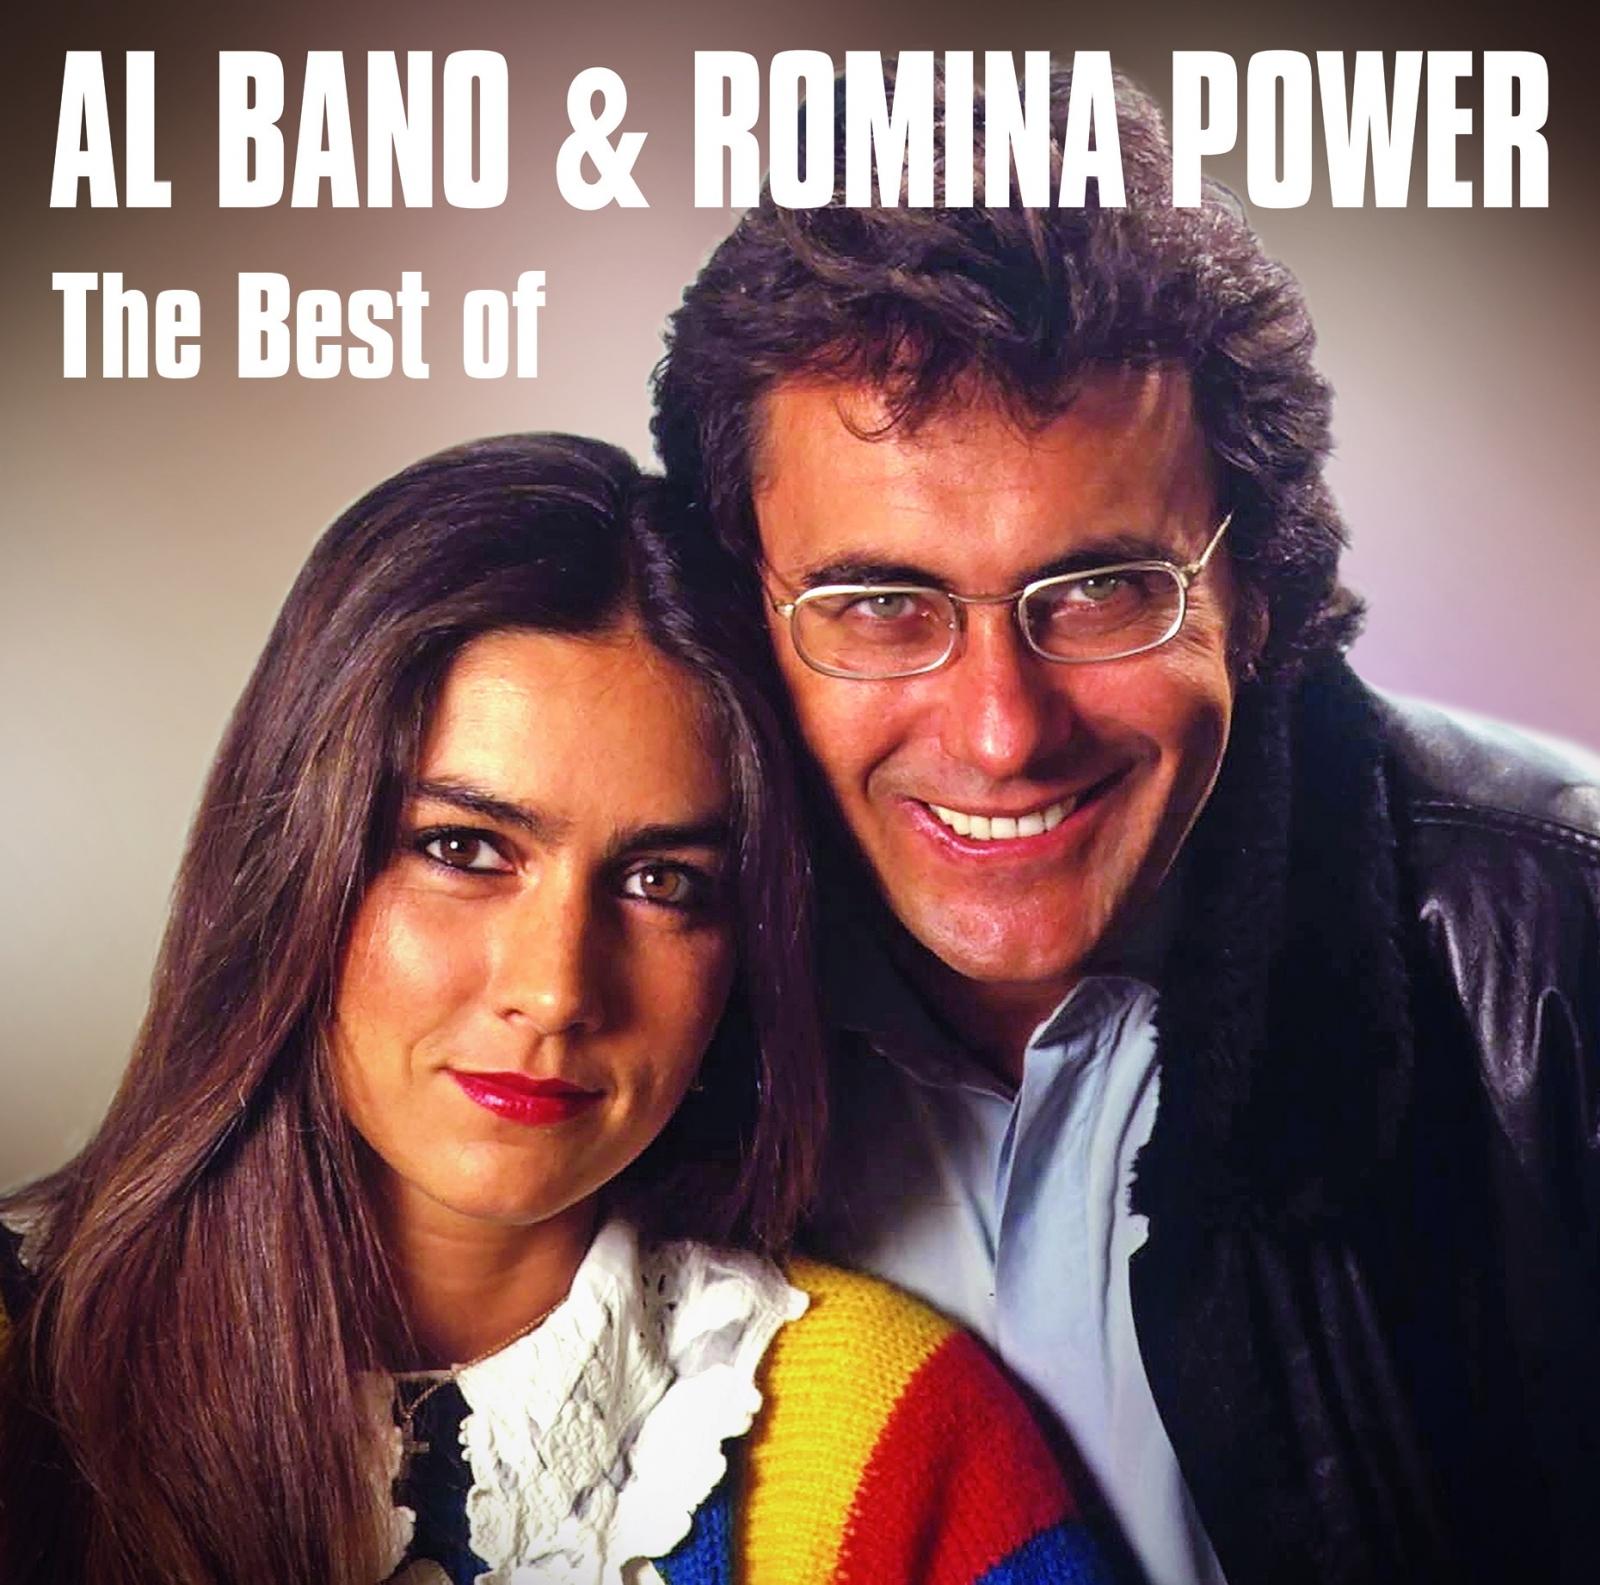 Al Bano & Romina Power – The Best Of (LP) фото